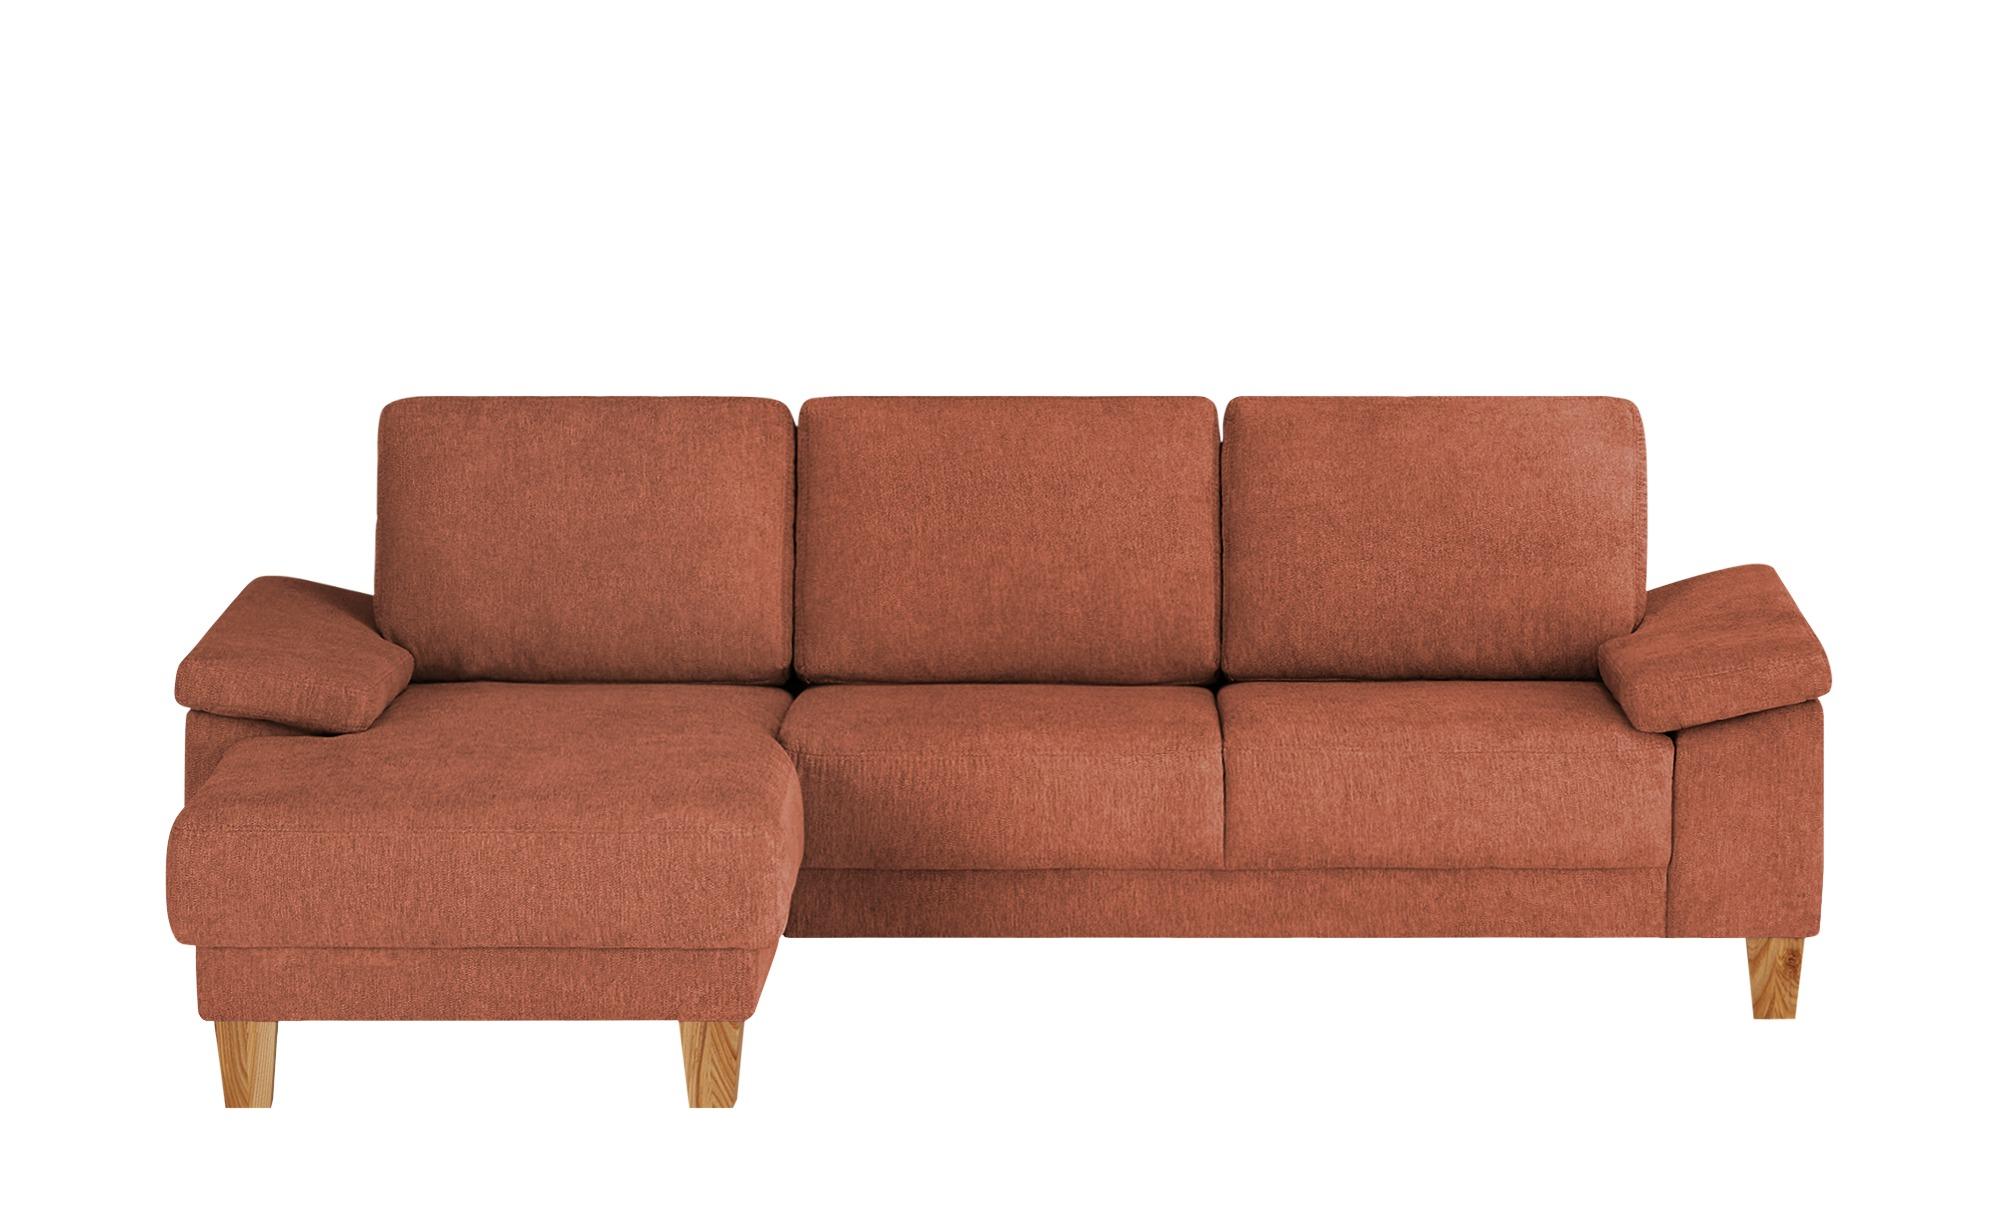 smart Ecksofa  Atara ¦ orange ¦ Maße (cm): H: 80 Polstermöbel > Sofas > Ecksofas - Höffner